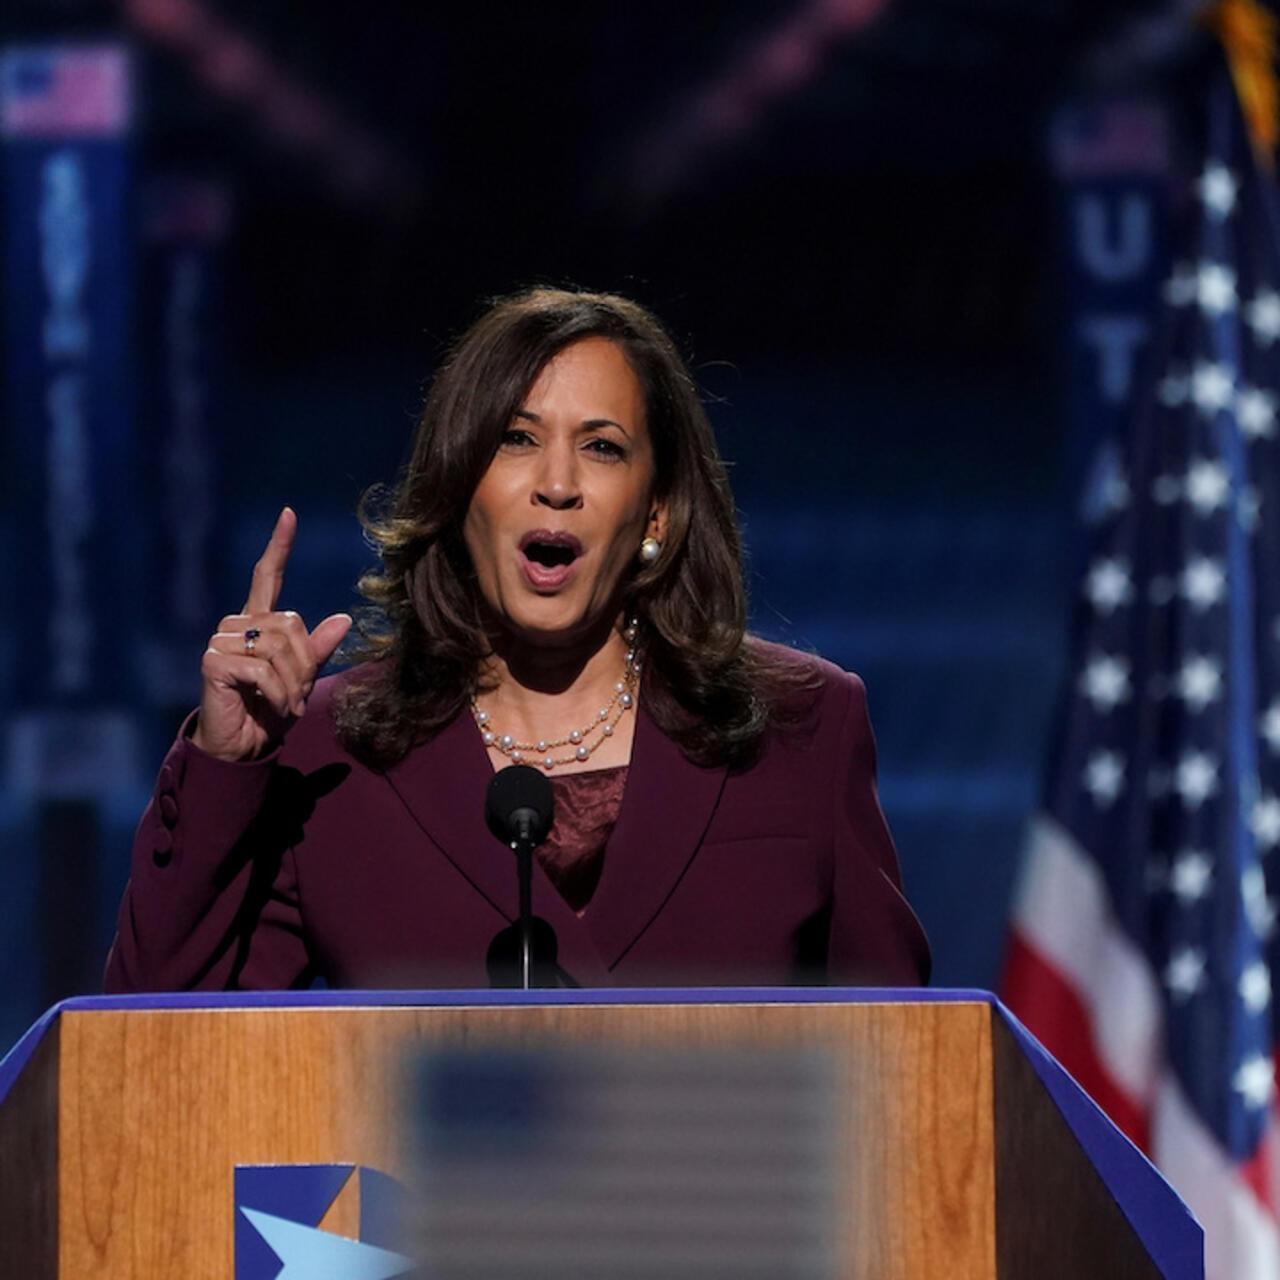 Kamala Harris Accepts Vp Nomination Making History On Third Night Of Democratic Convention